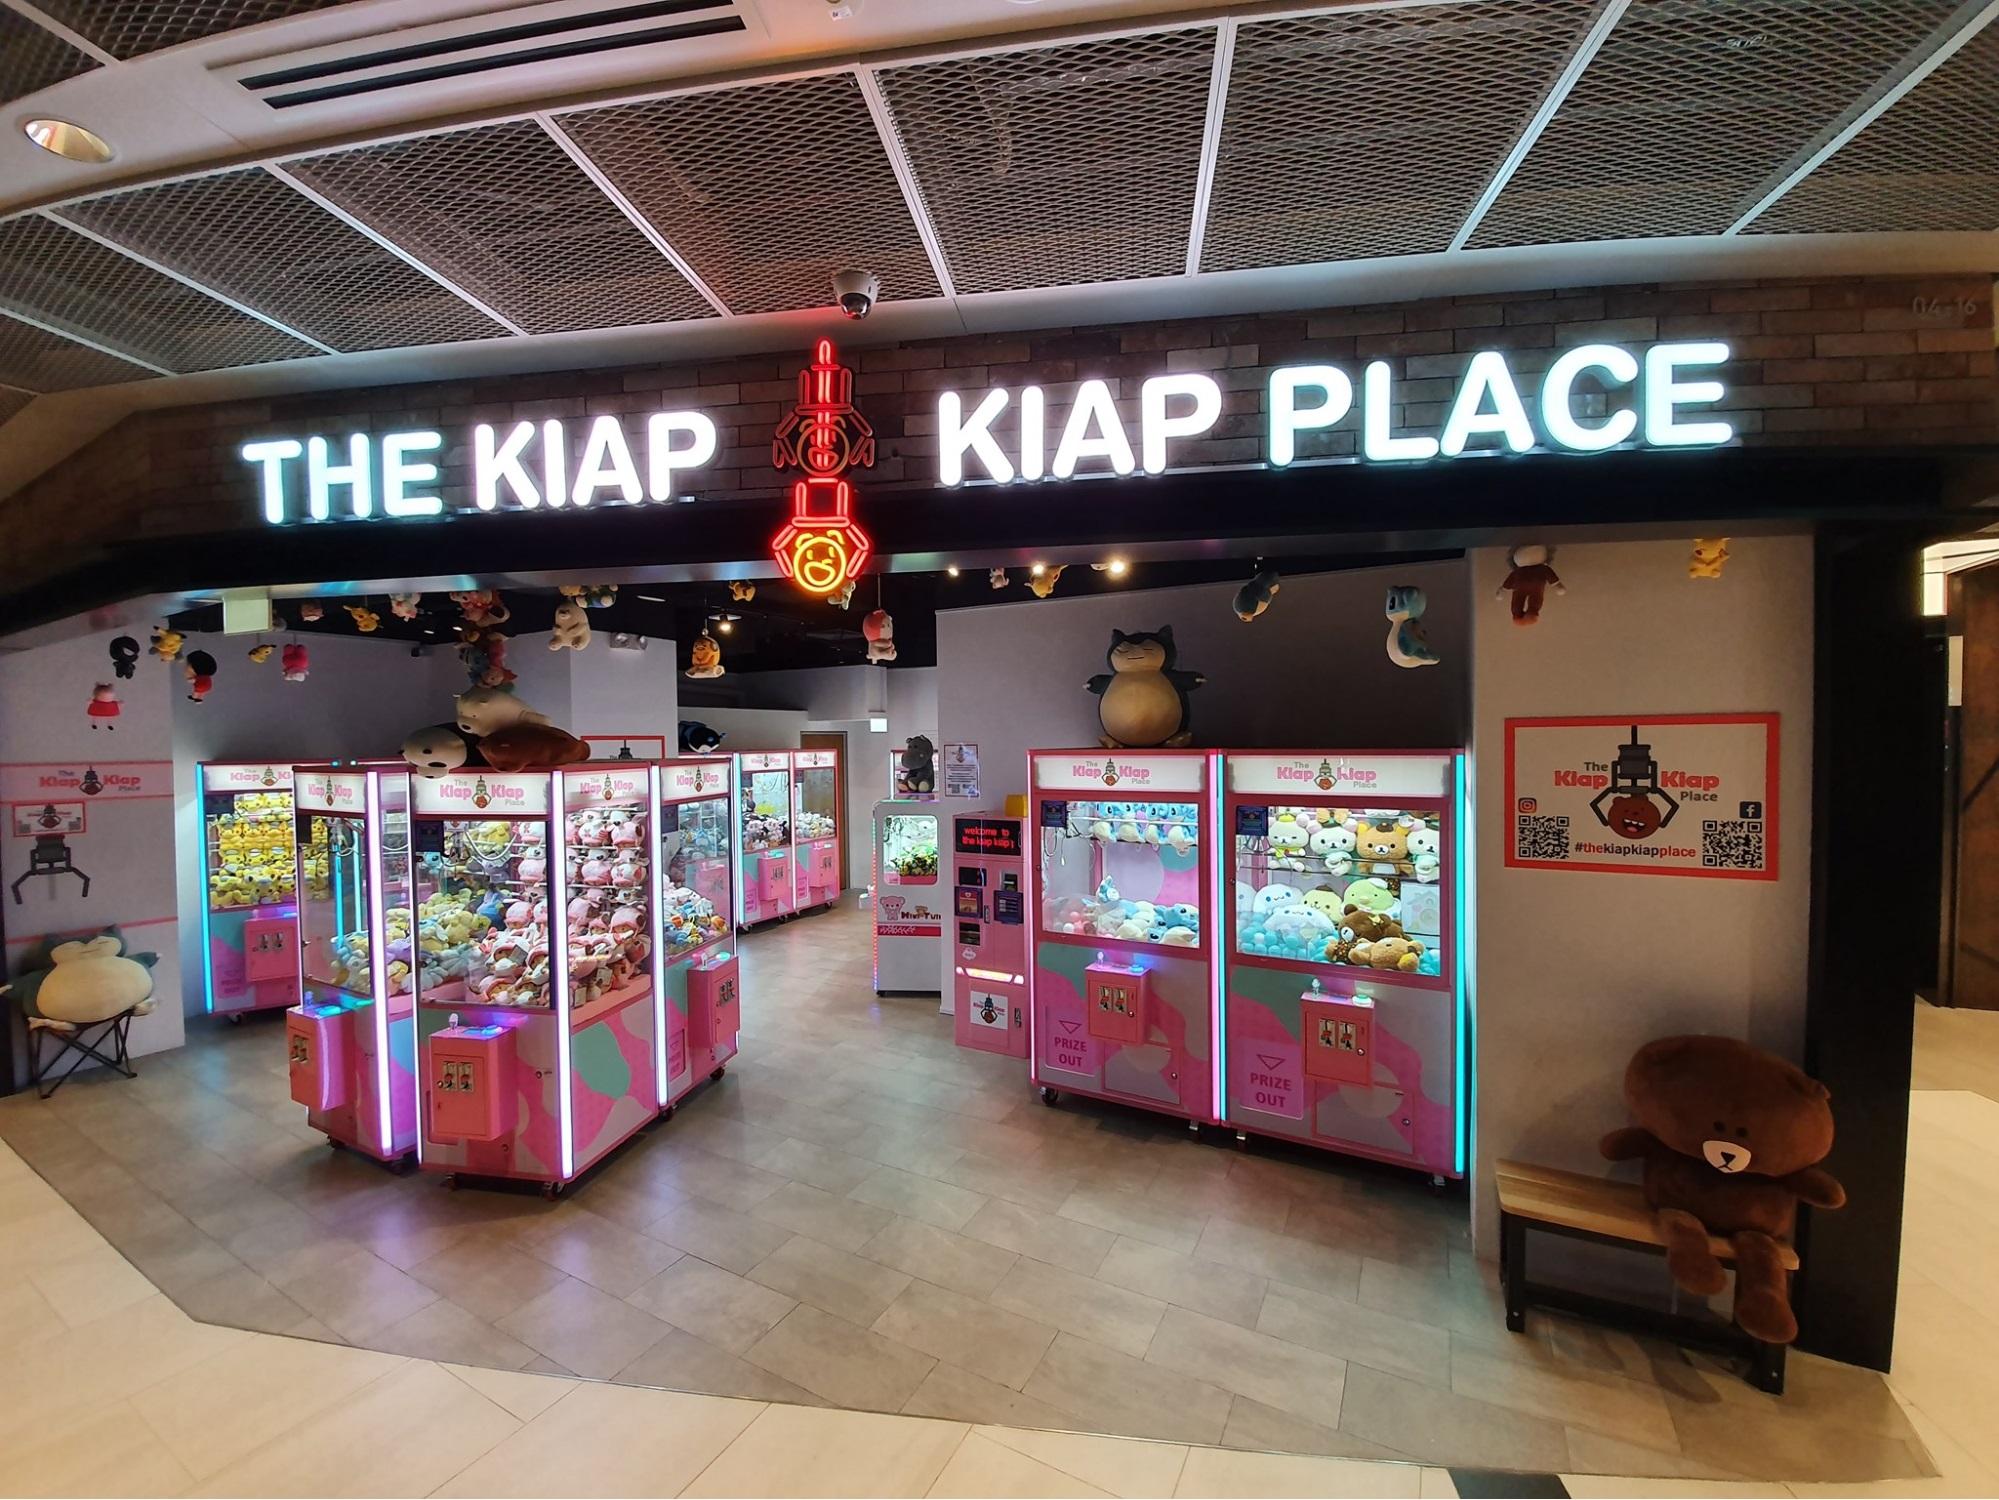 claw machine arcades 2019 kiap kiap